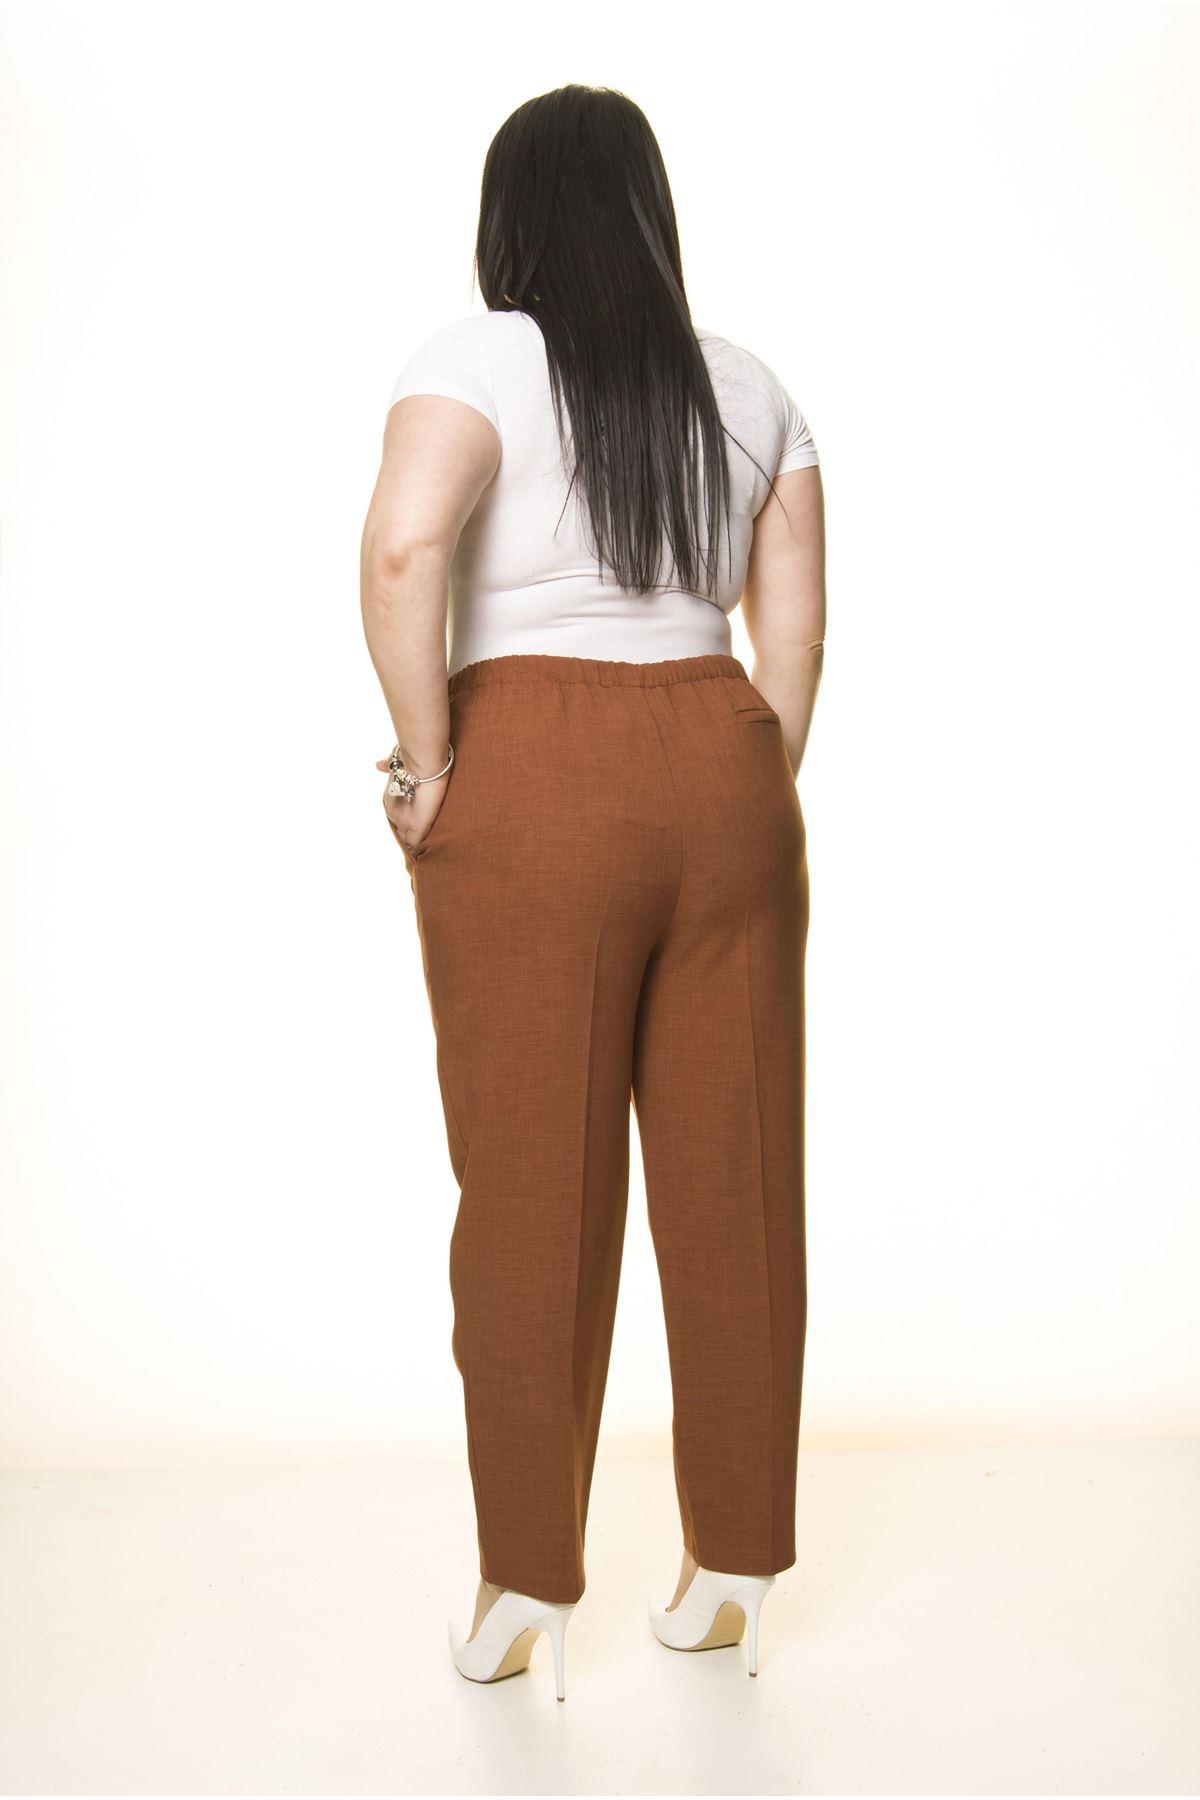 Kahverengi Büyük Beden Kumaş Pantolon L1-1696